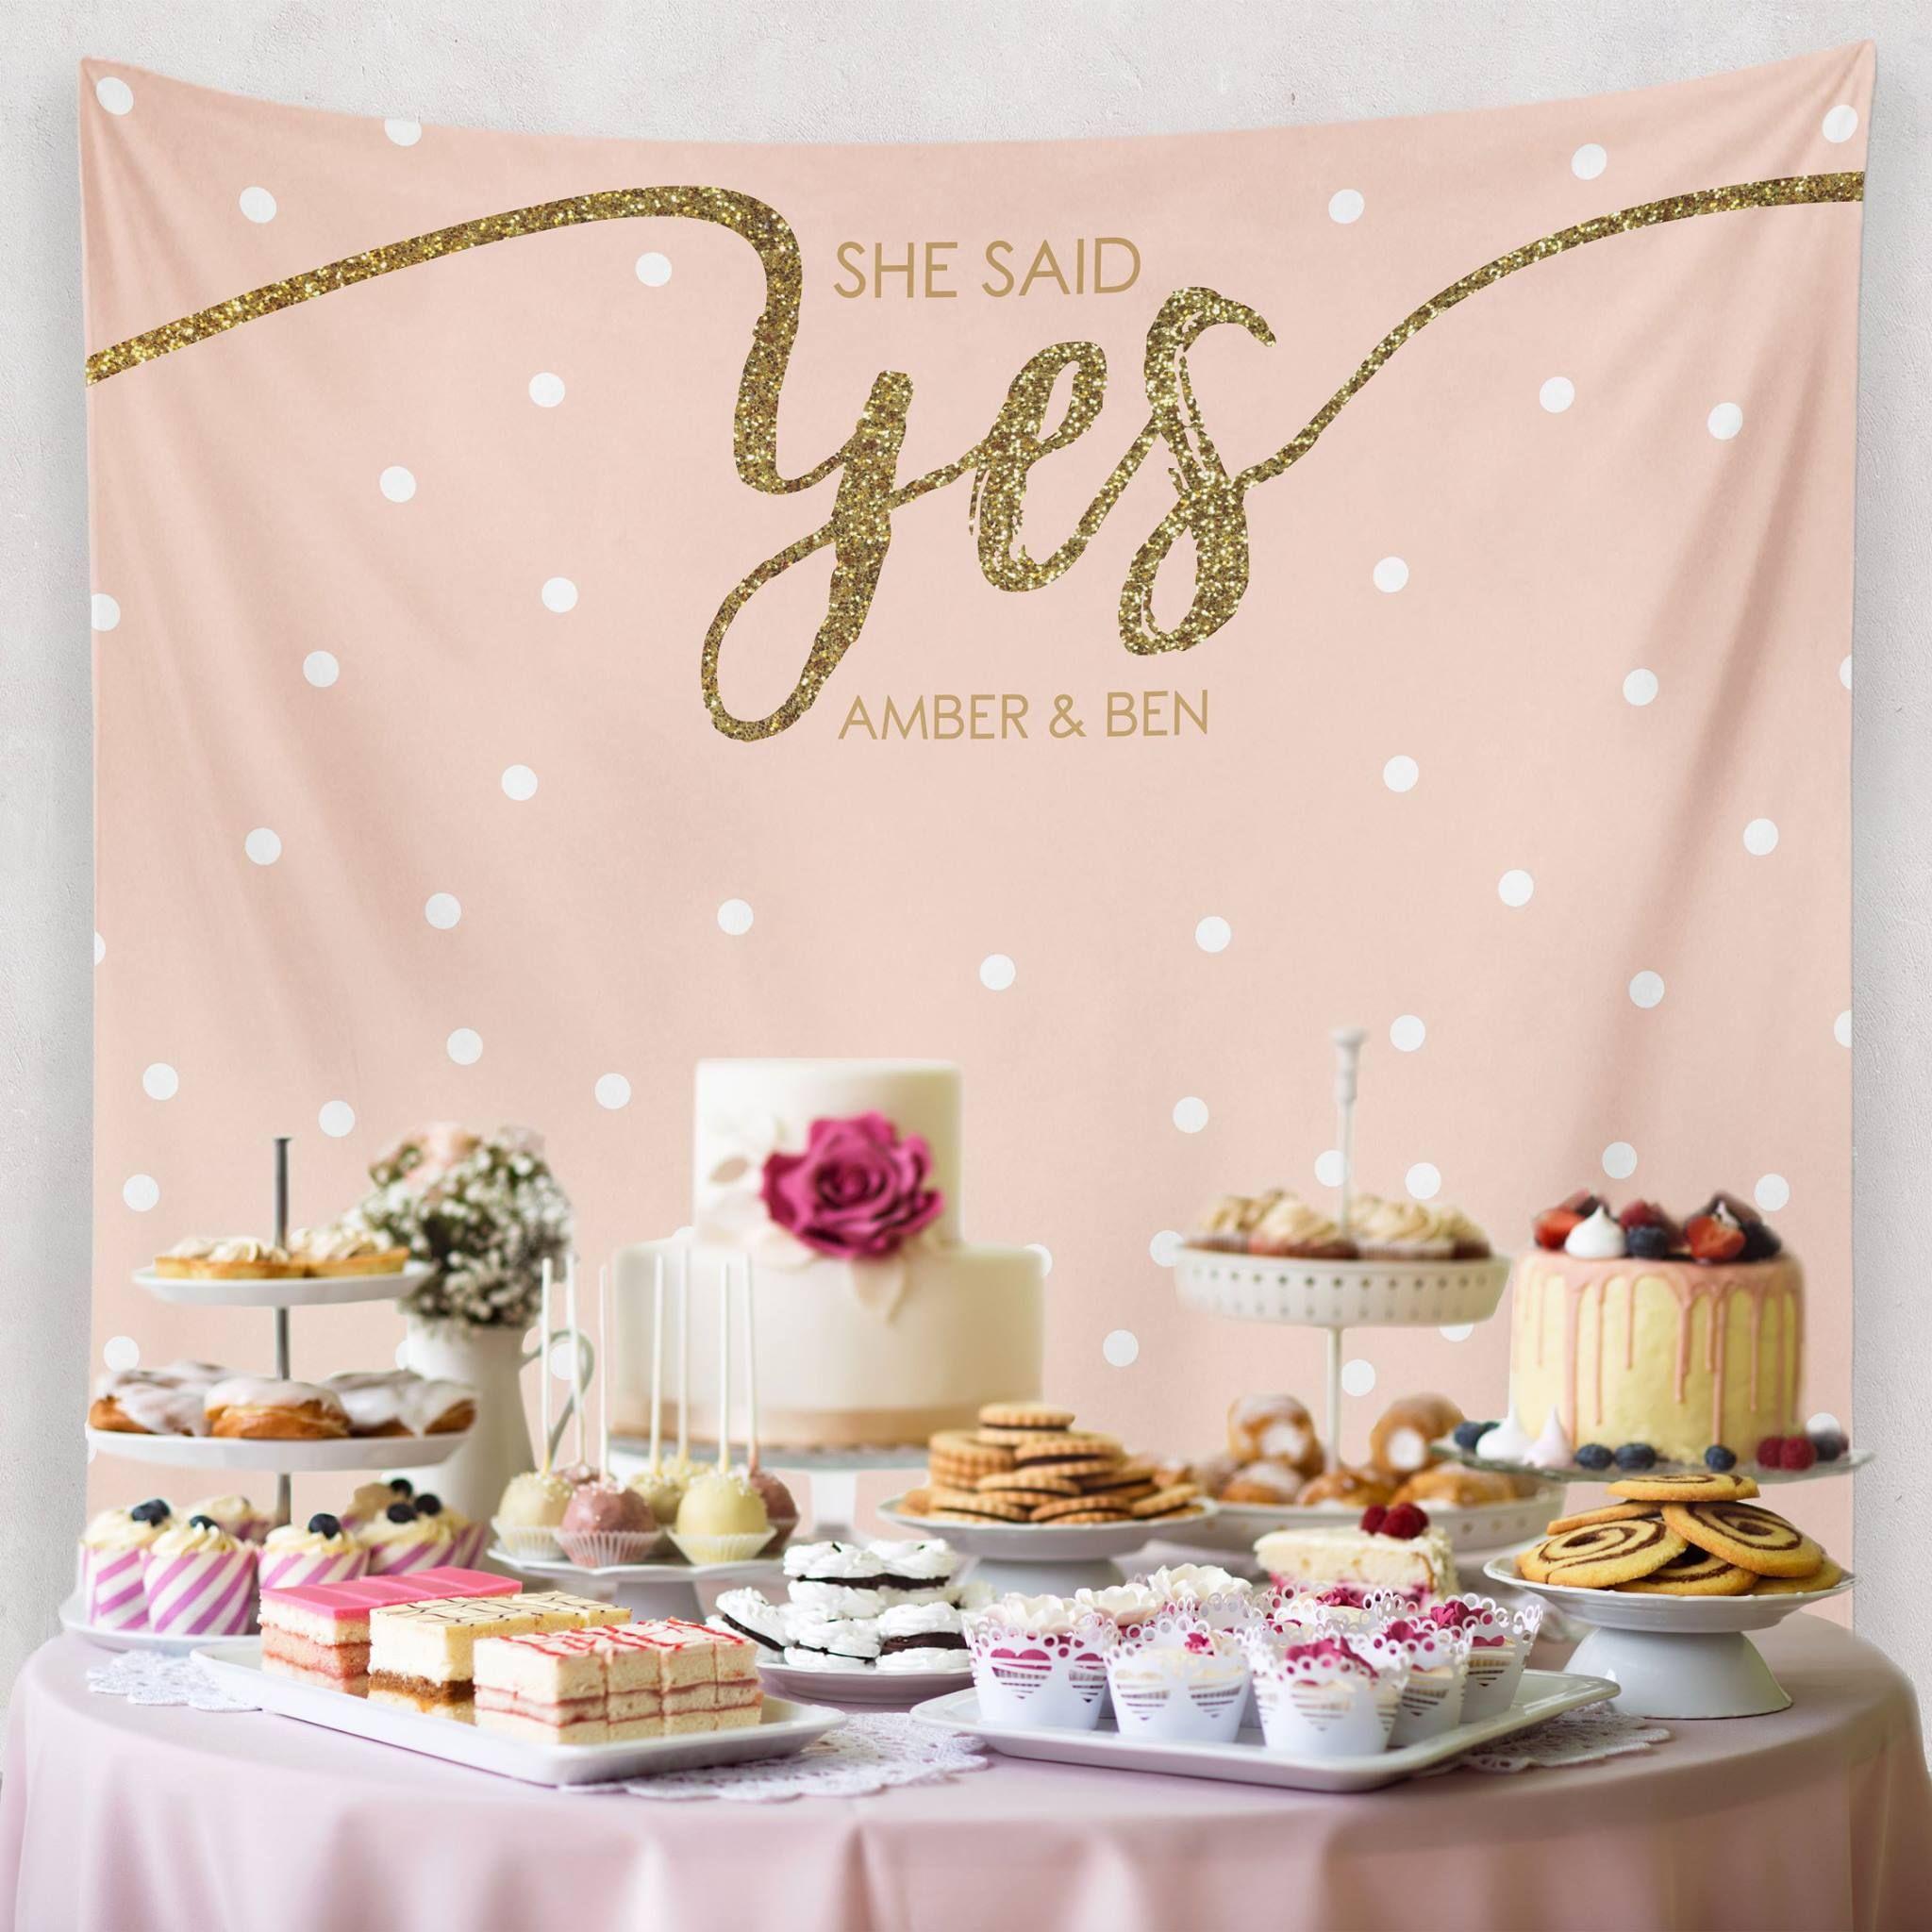 Wedding Dessert Table Backdrop: Custom Wedding Tapestries For Dessert Backdrops And Photo